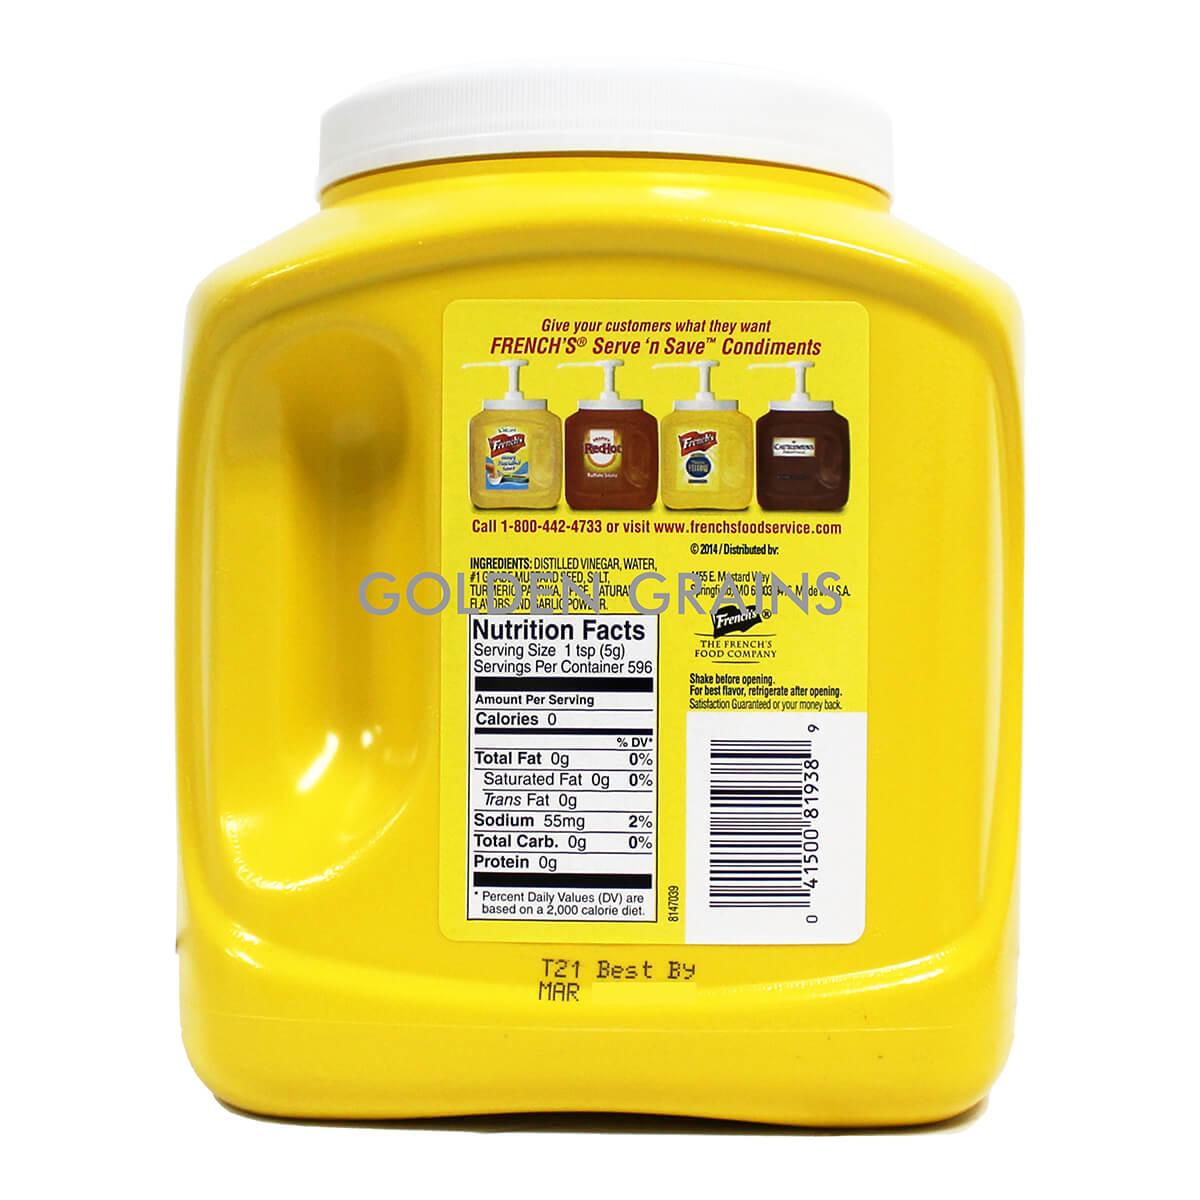 Golden Grains Dubai Export - Frenchs - Mustard Big - Back.jpg